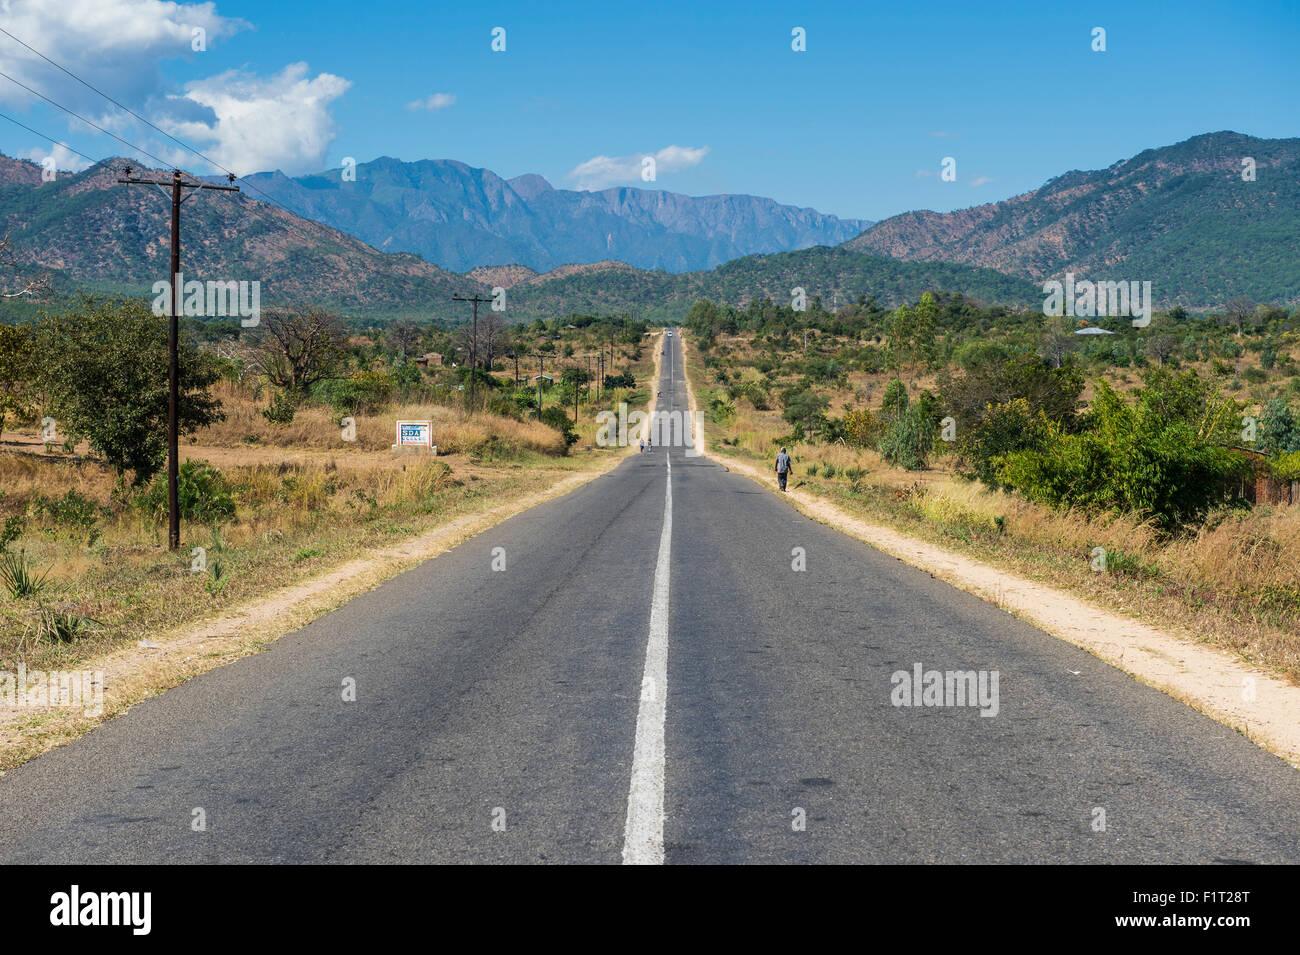 Lunga strada diritta nel Malawi centrale, Africa Immagini Stock